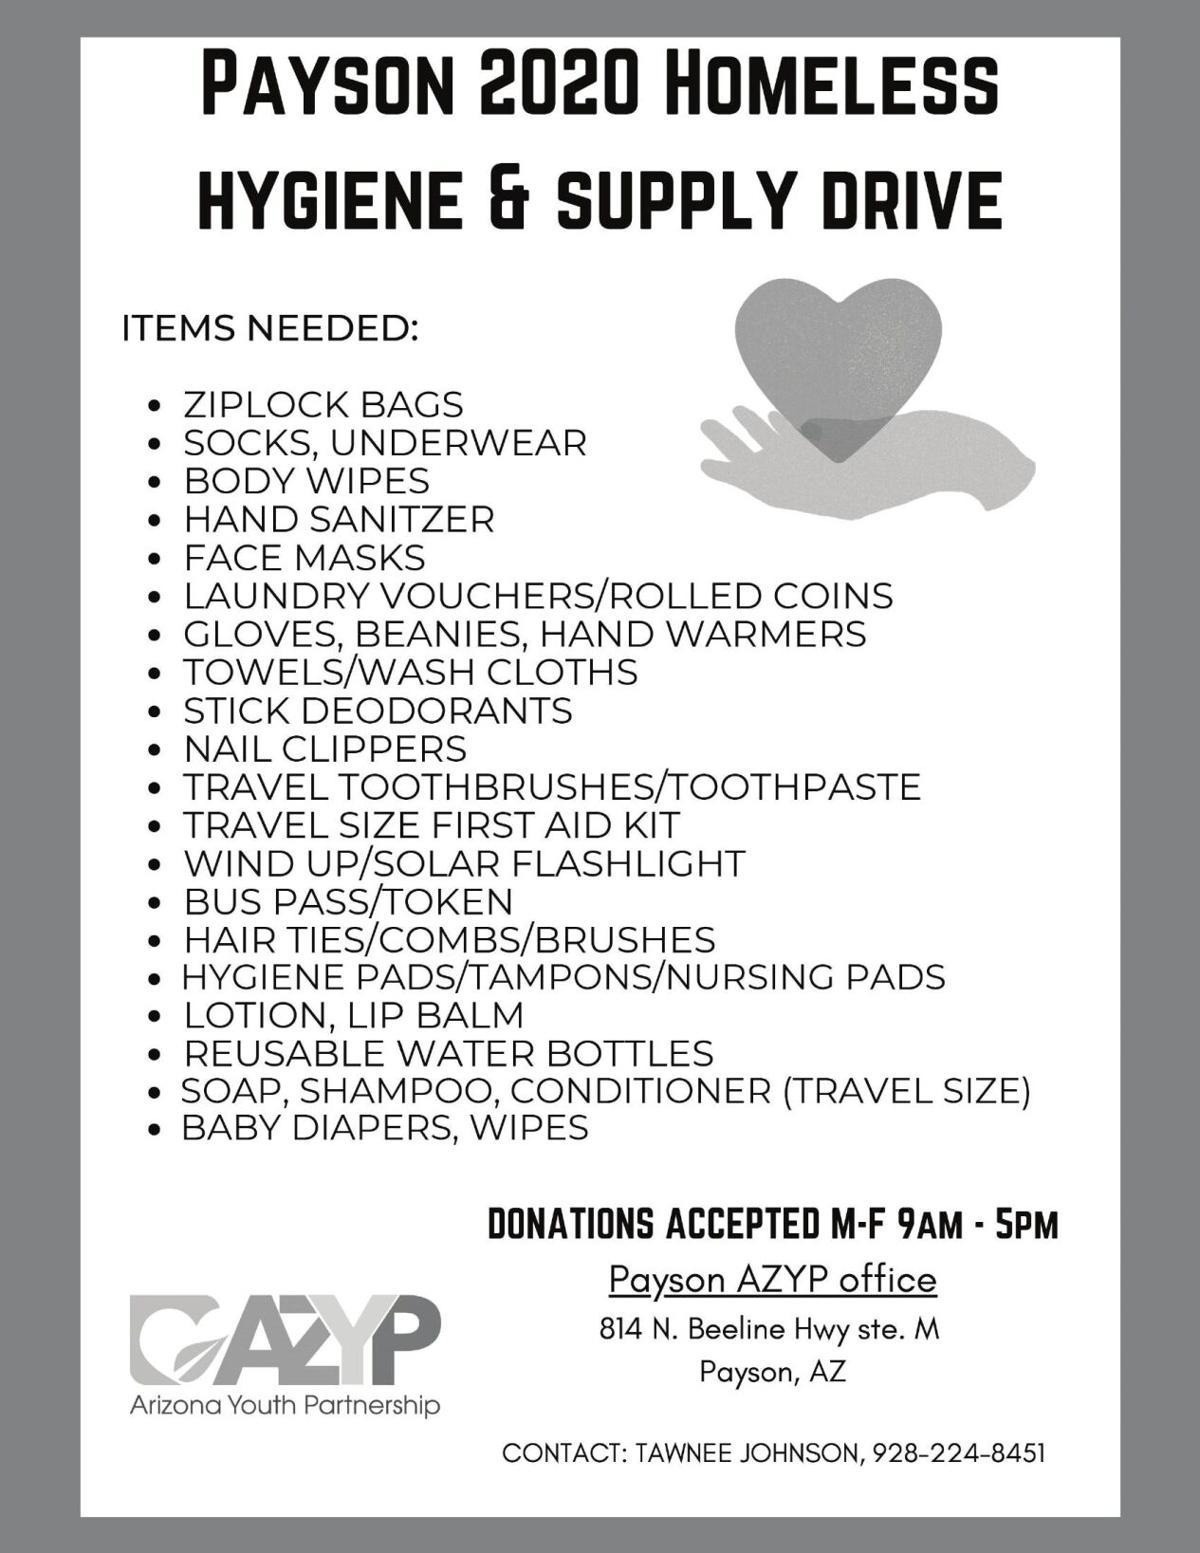 Homeless Hygiene & Supply Drive